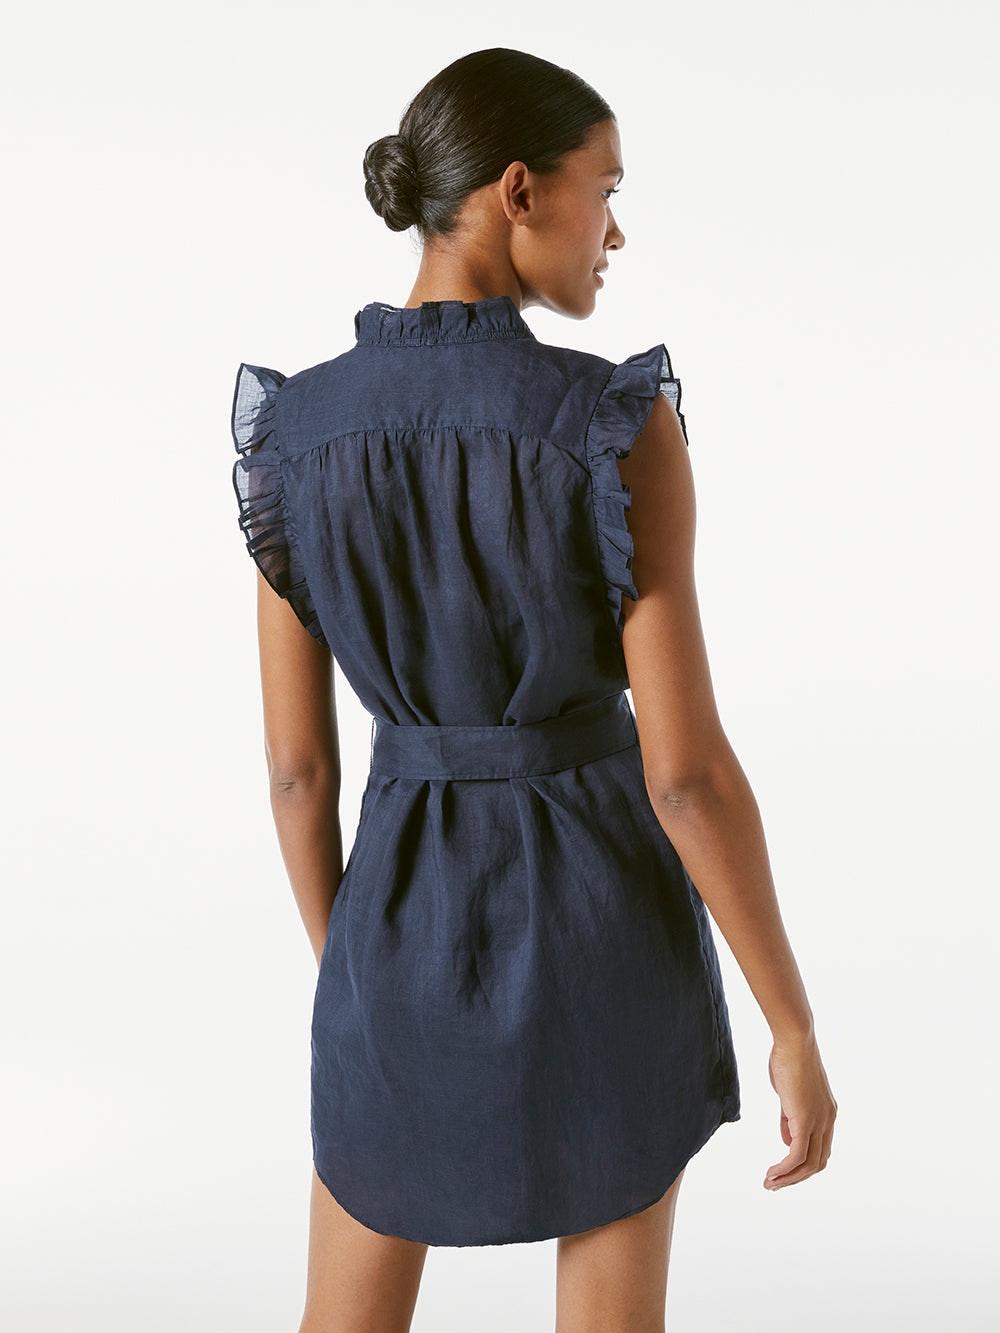 dress back view 2